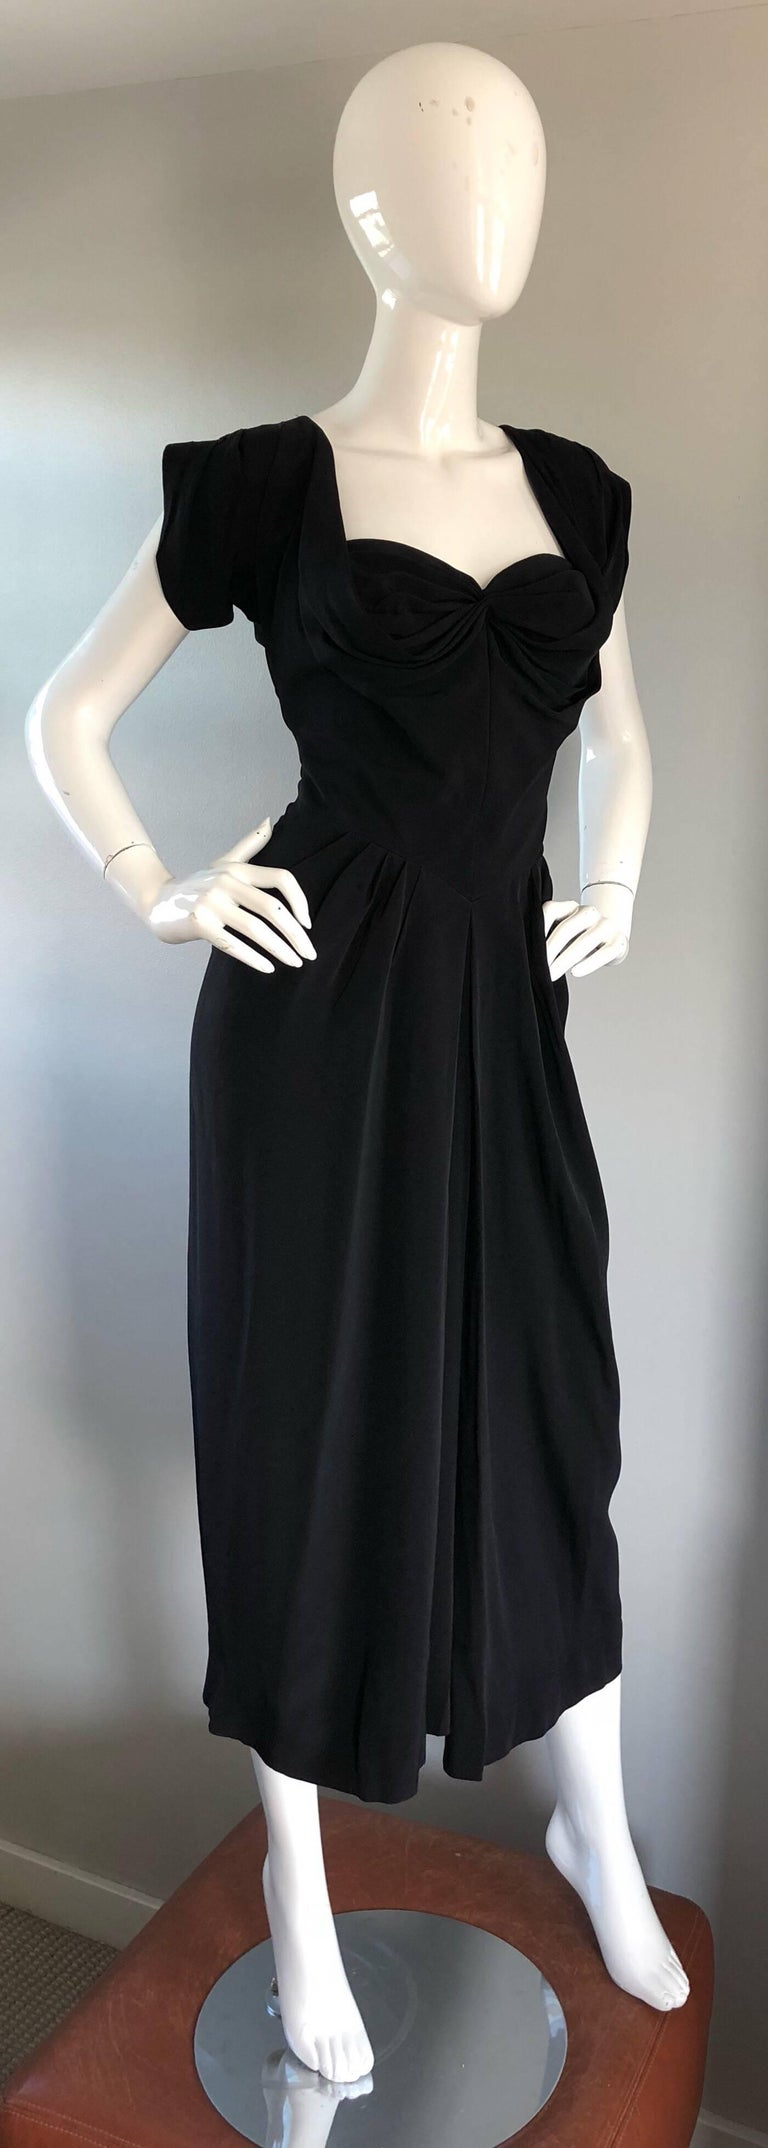 1950s Dorothy O'Hara Black Crepe Cap Sleeve Sweetheart Neck Vintage 50s Dress For Sale 1